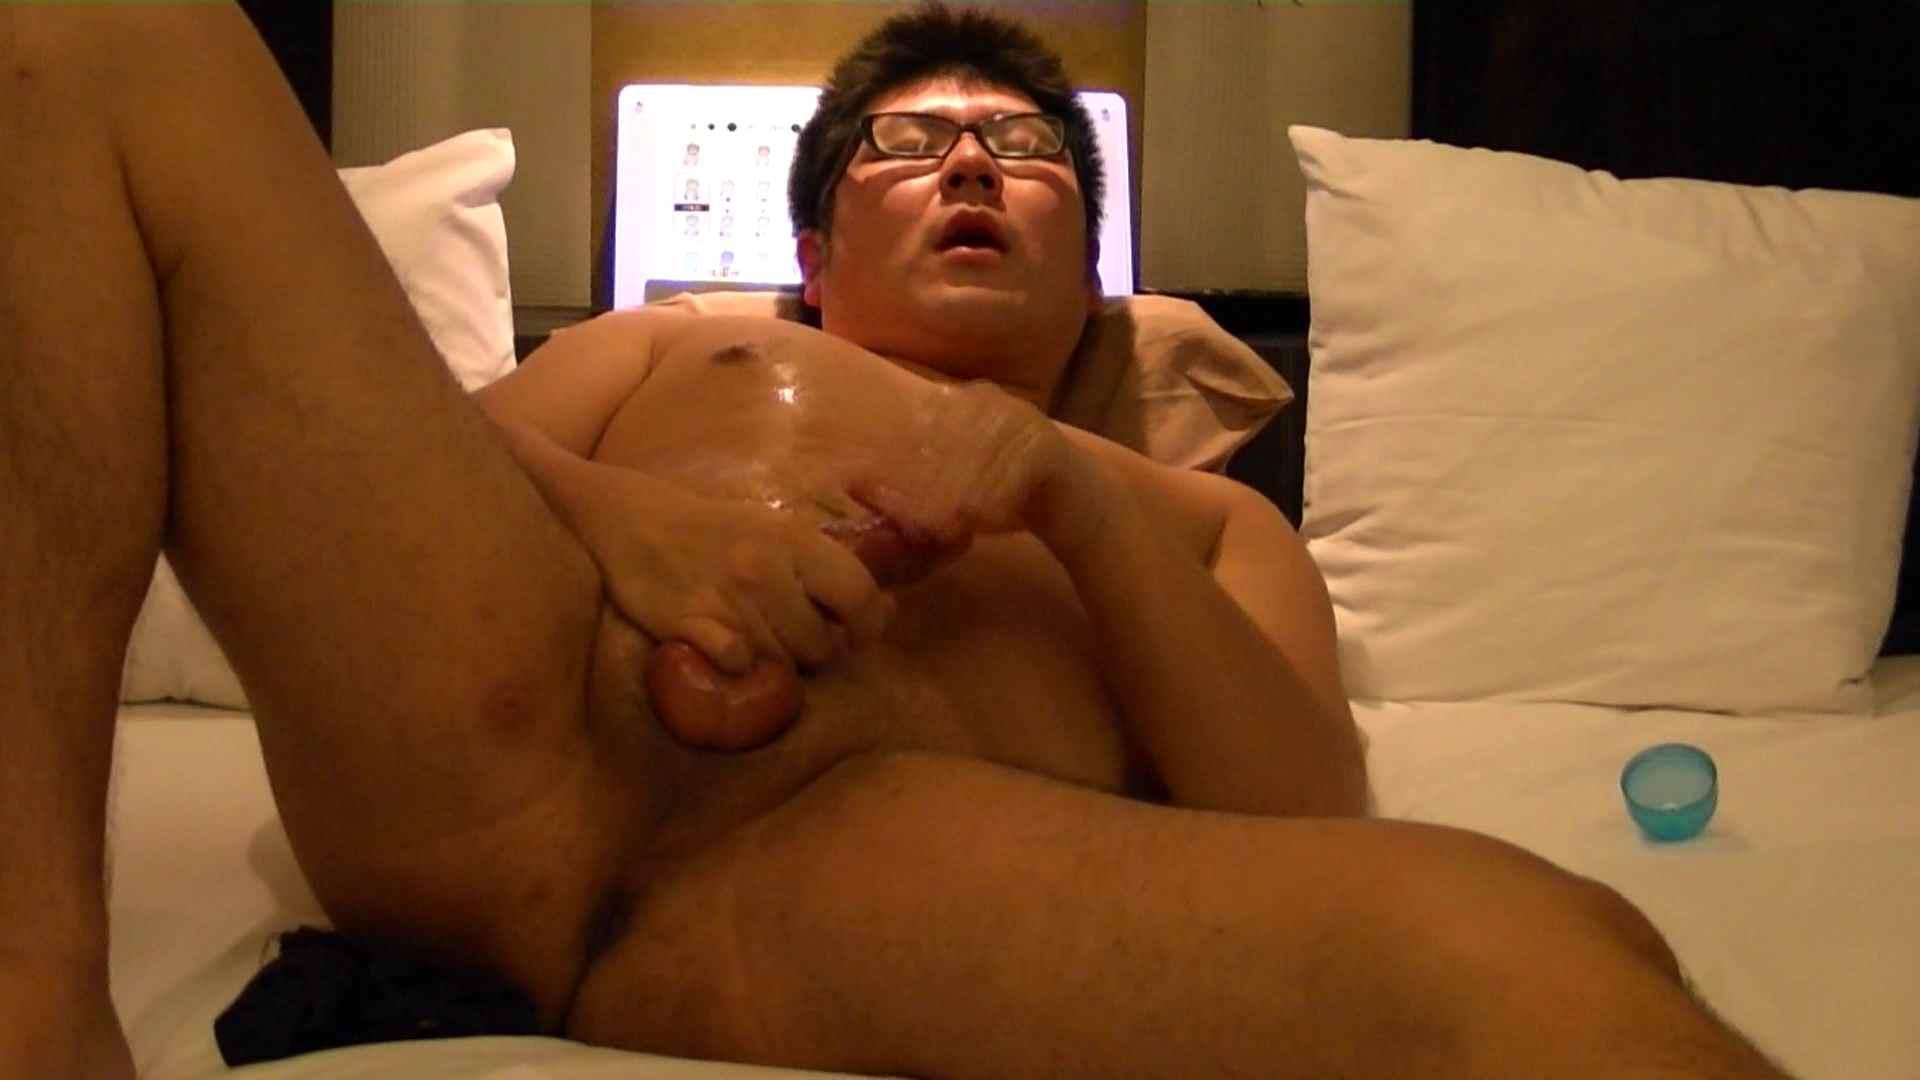 Mr.オナックスさん投稿!HD 貴方のオナニー三万円で撮影させてください。VOL.03 後編 完全無修正でお届け | オナニー特集  83pic 57